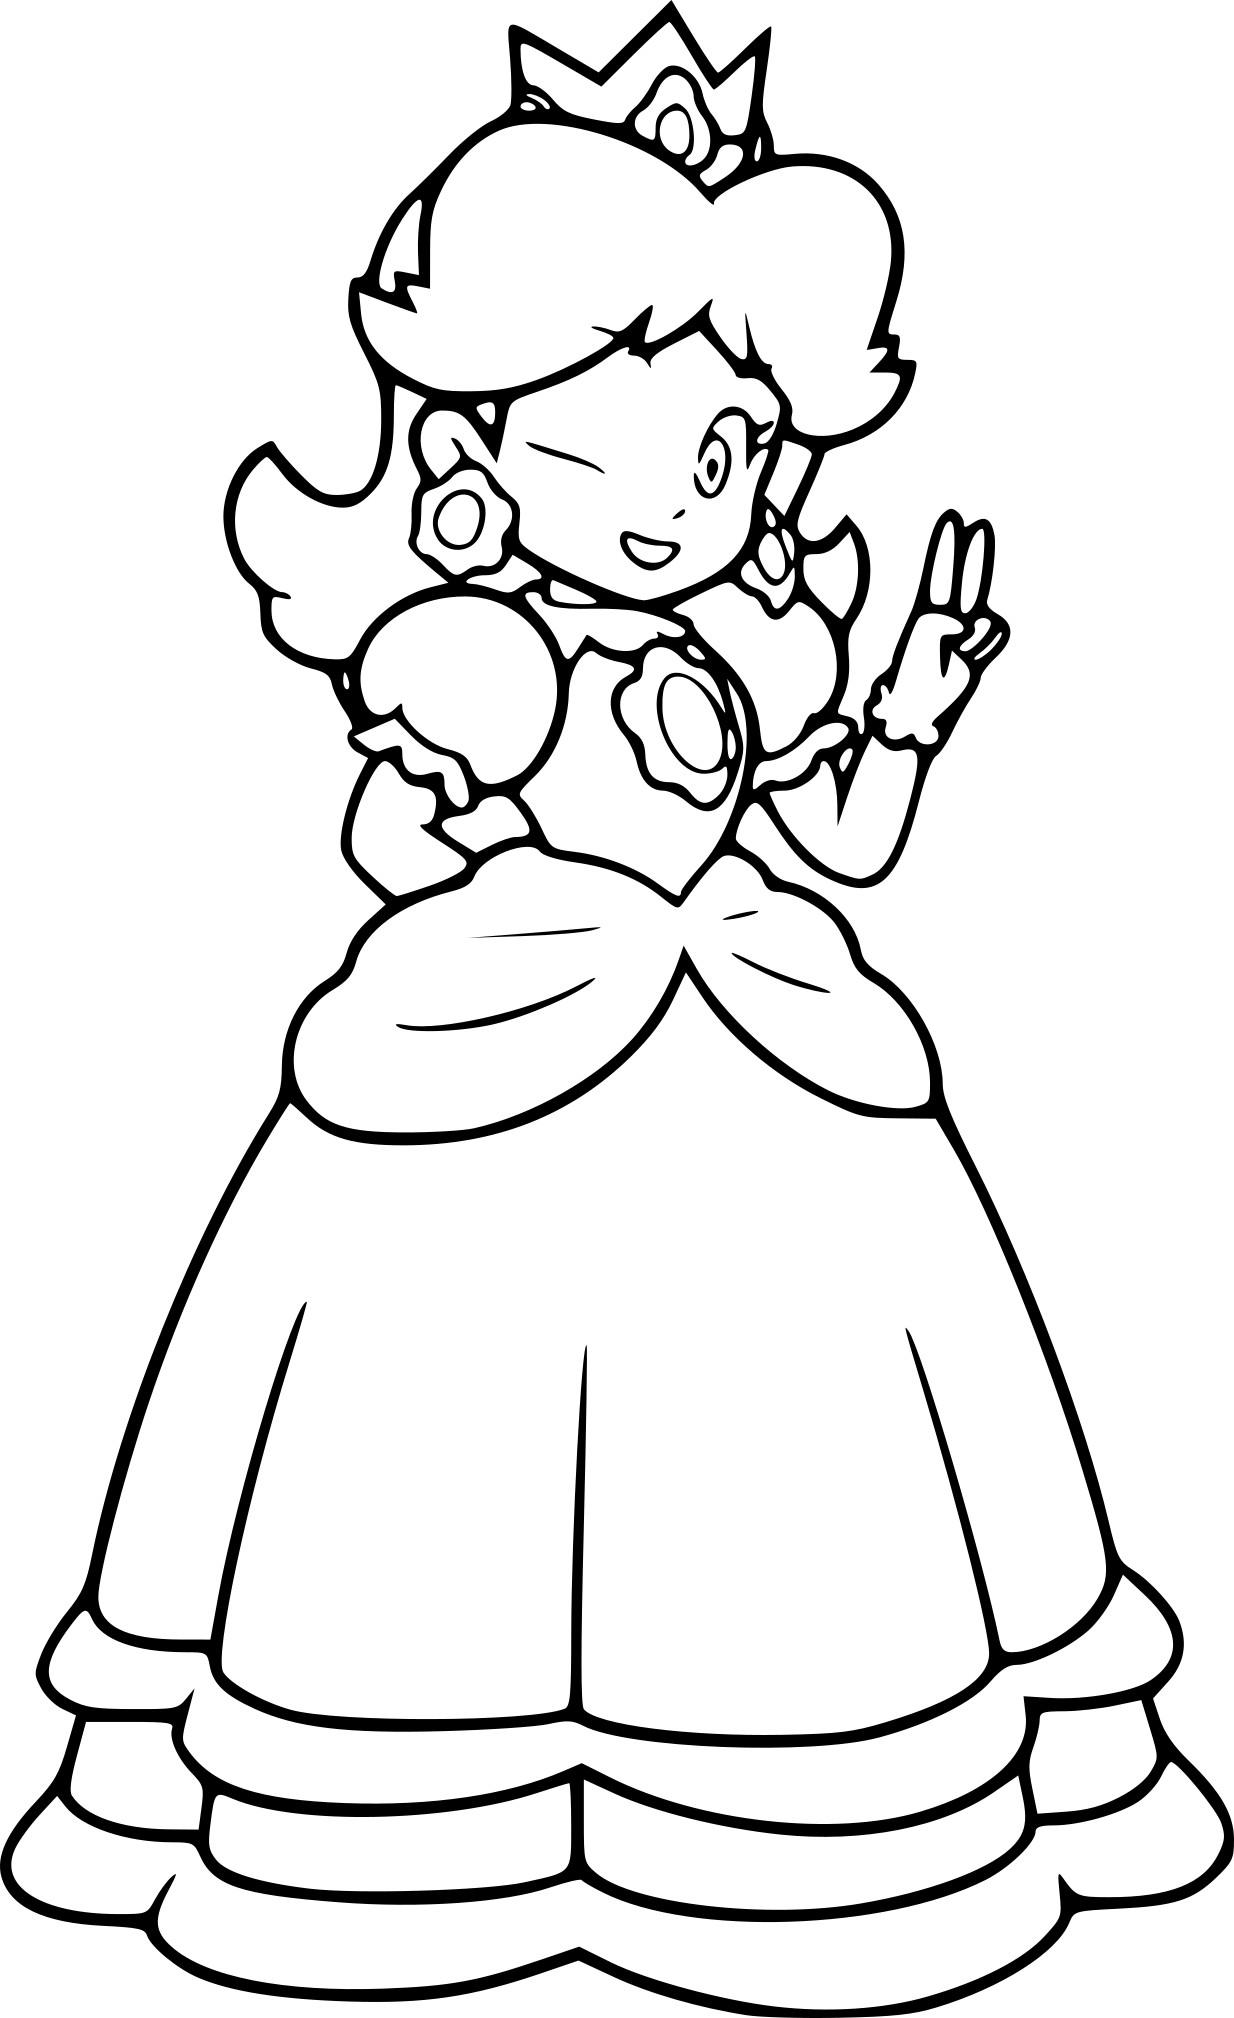 Coloriage princesse daisy imprimer - Coloriage de mario et luigi ...